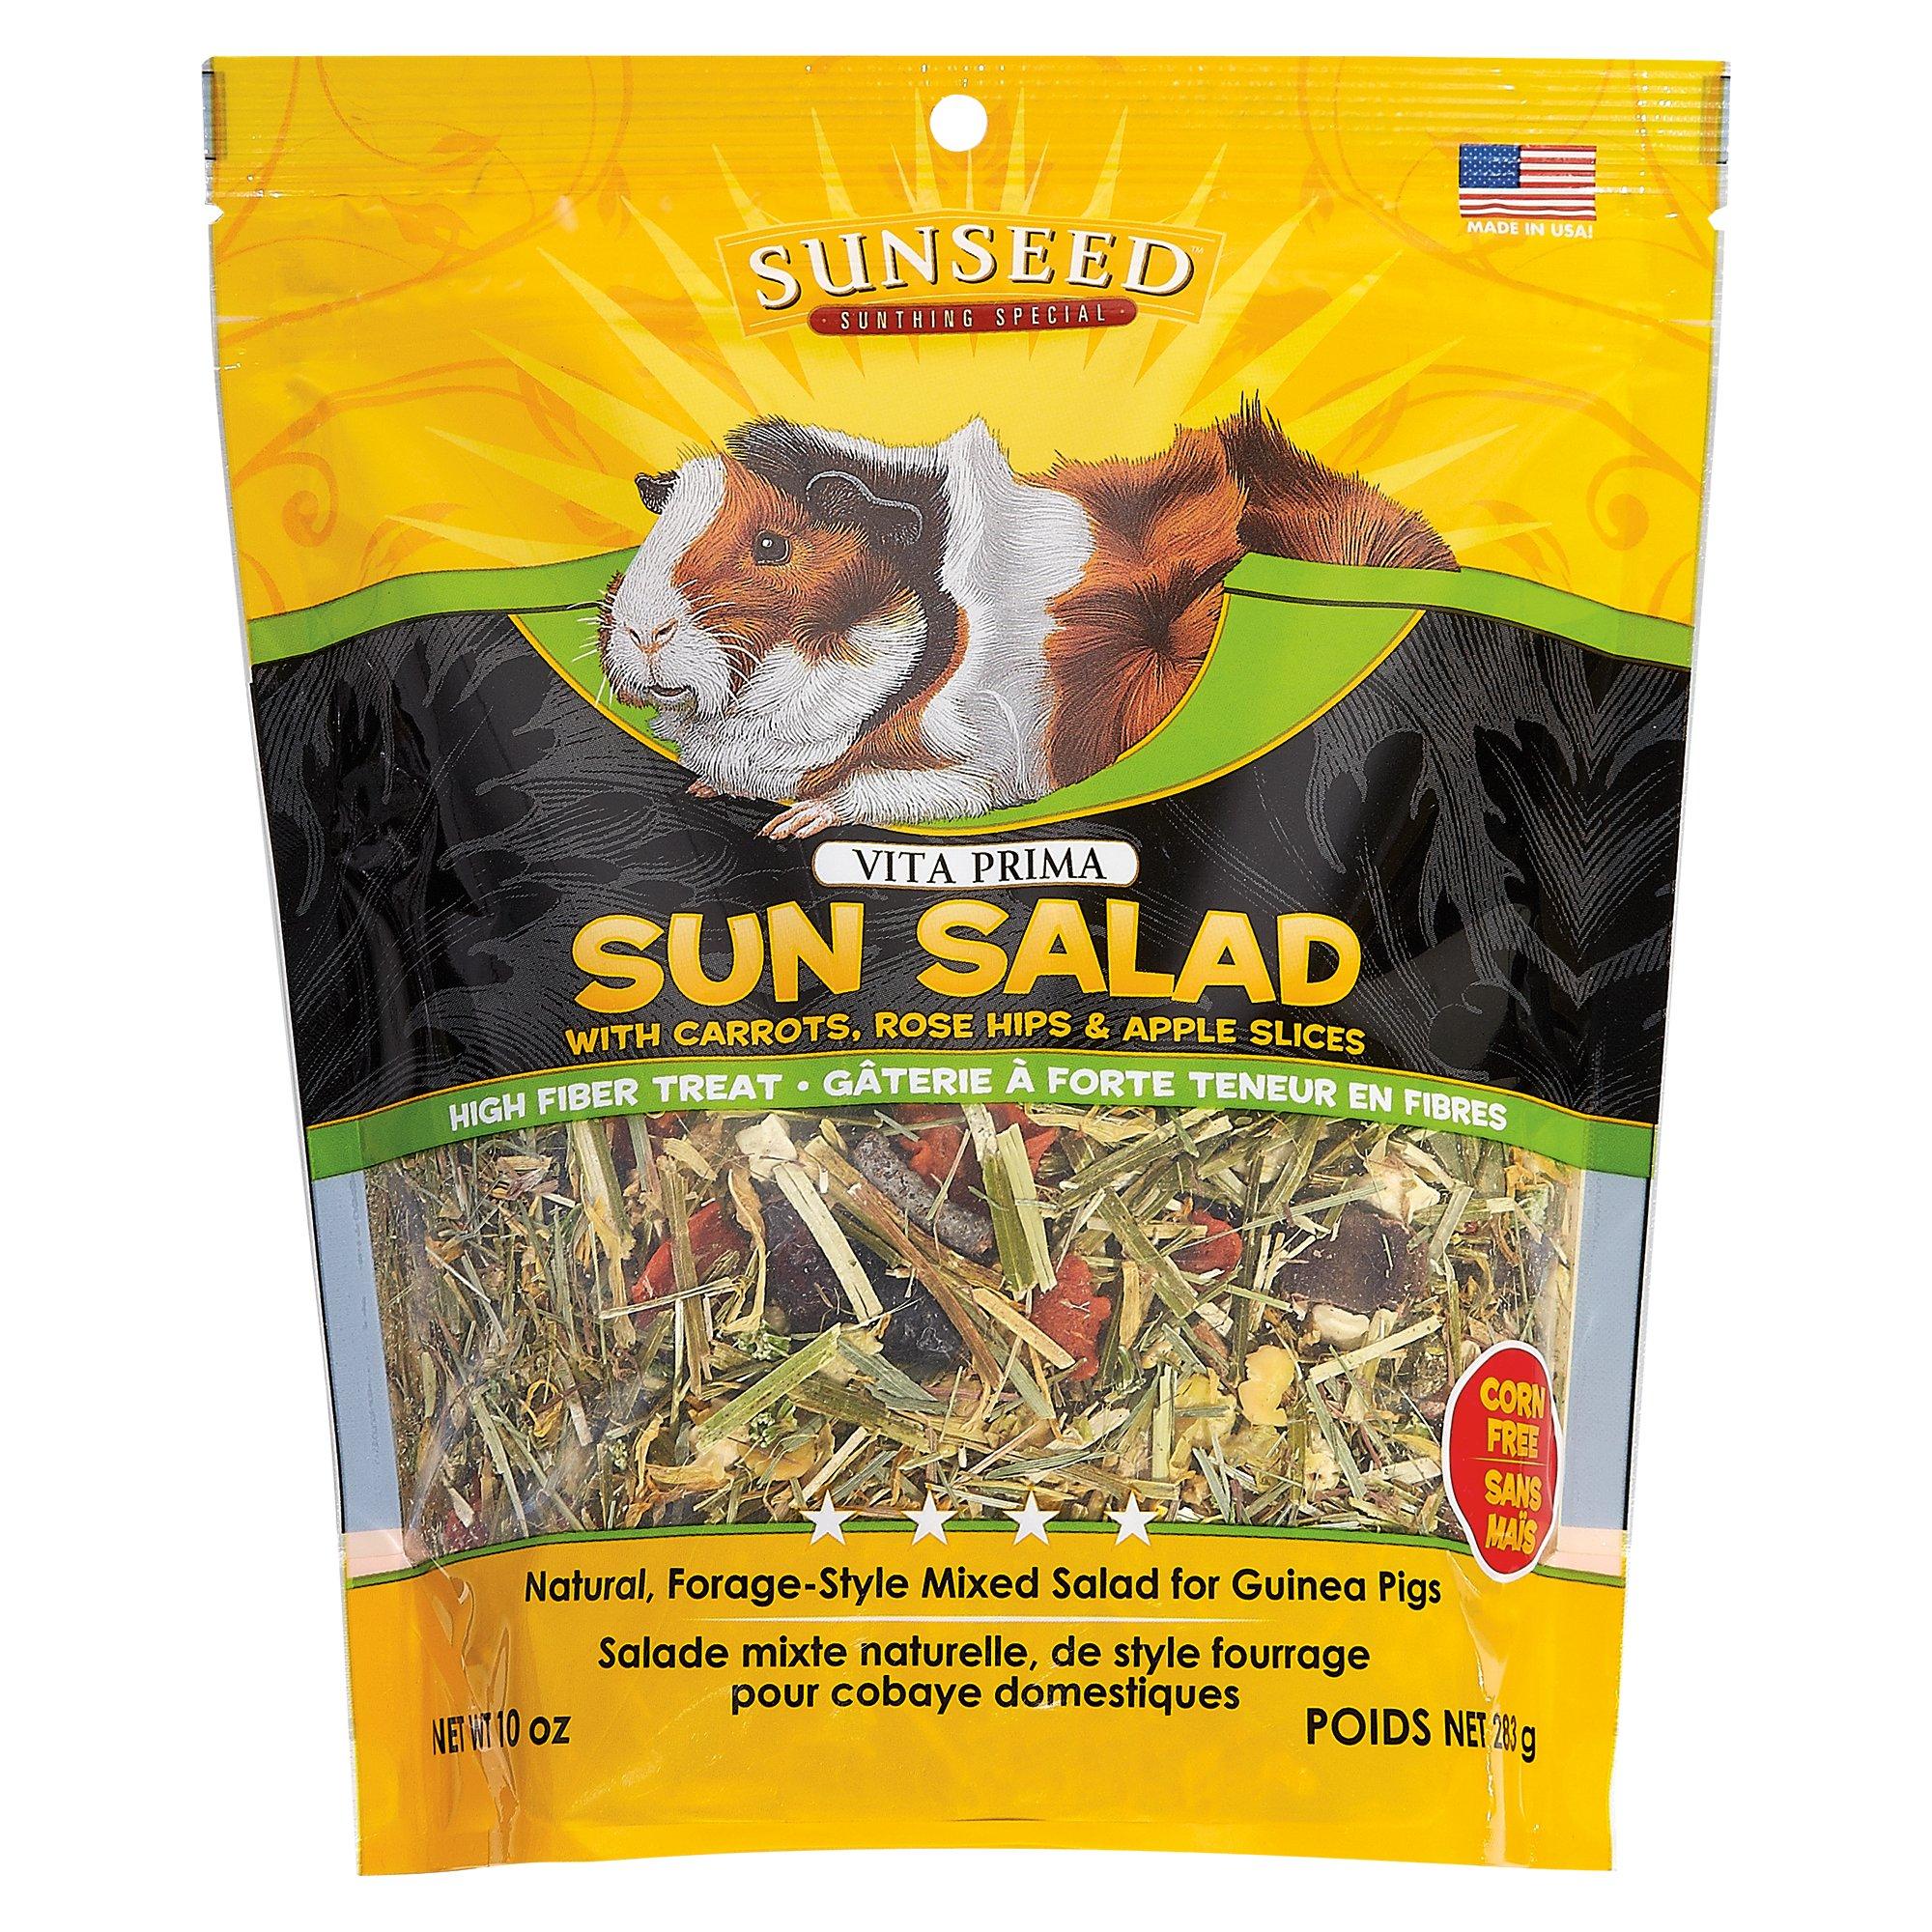 Sun Seed Vita Prima Sun Salad Guinea Pig Treat   Petco at Petco in Braselton, GA   Tuggl